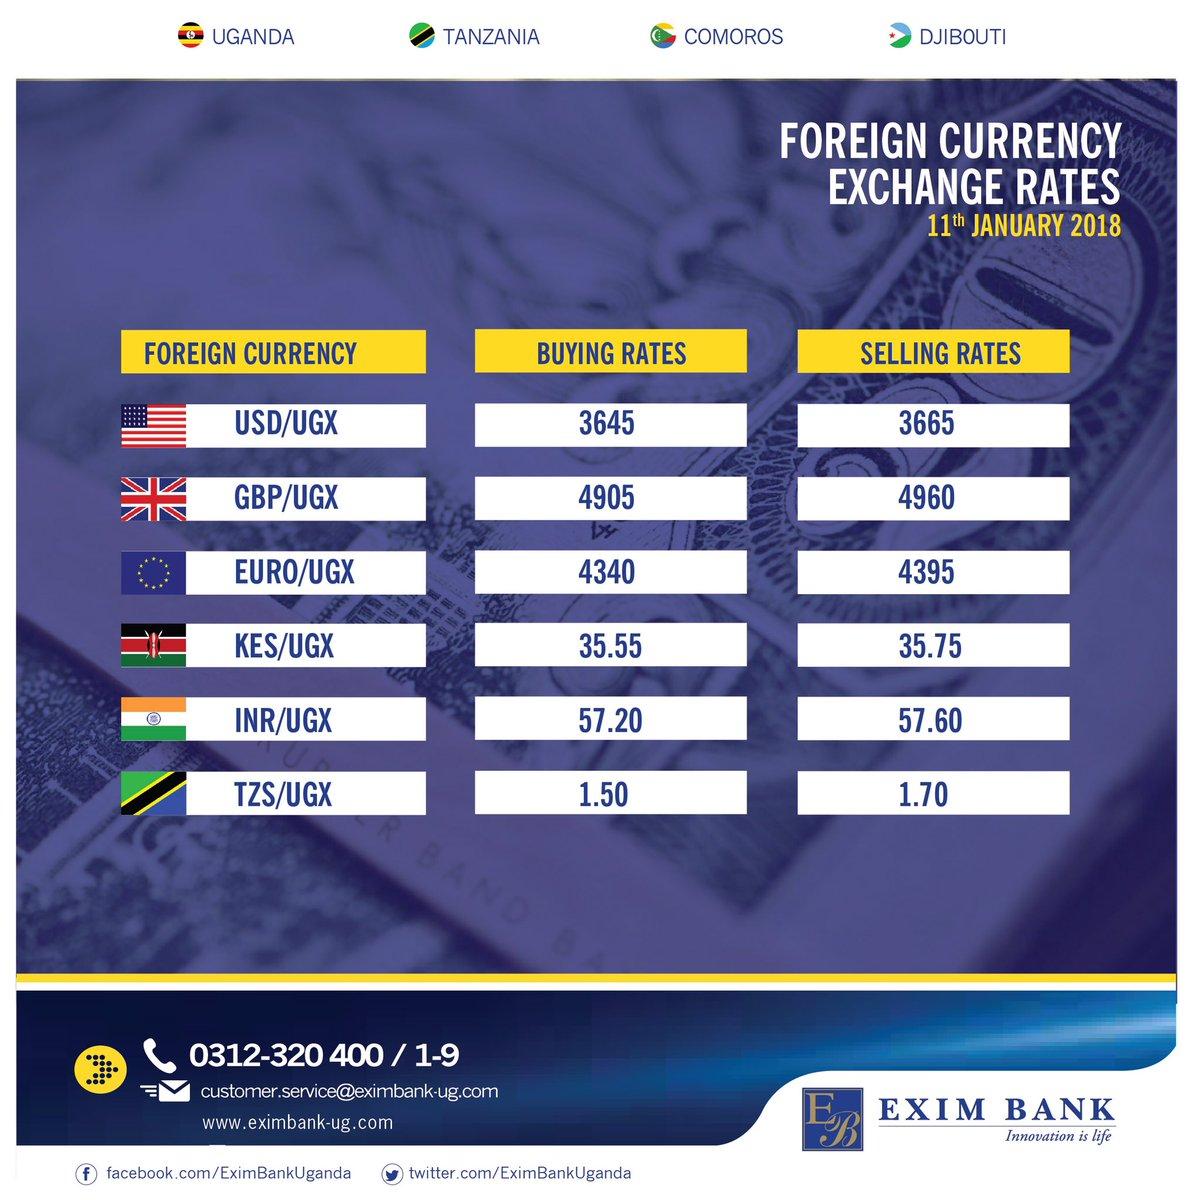 Exim Bank Uganda